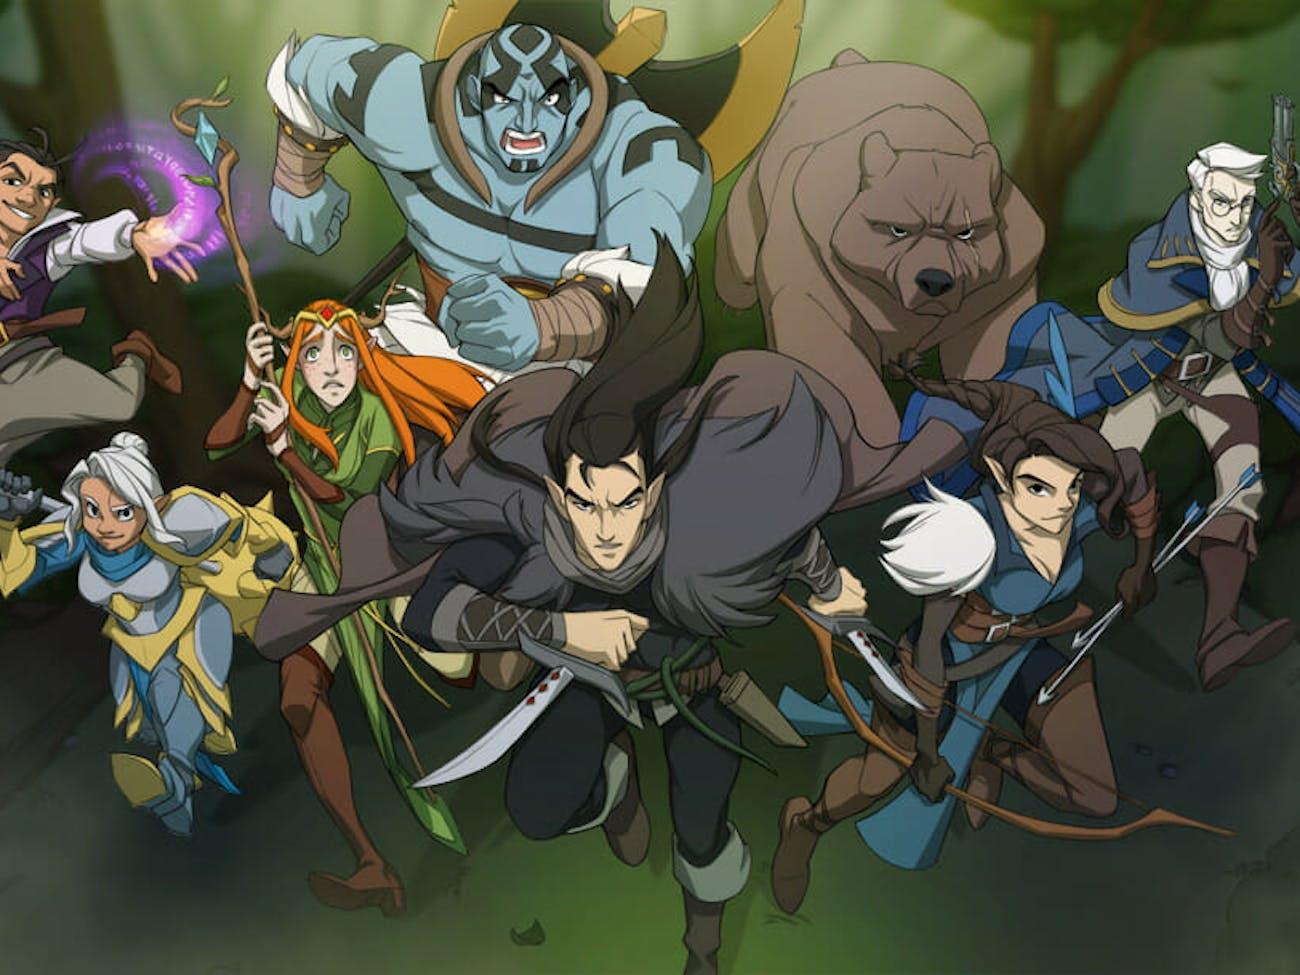 Critical Role Animated Series: After Kickstarter, Work Begins